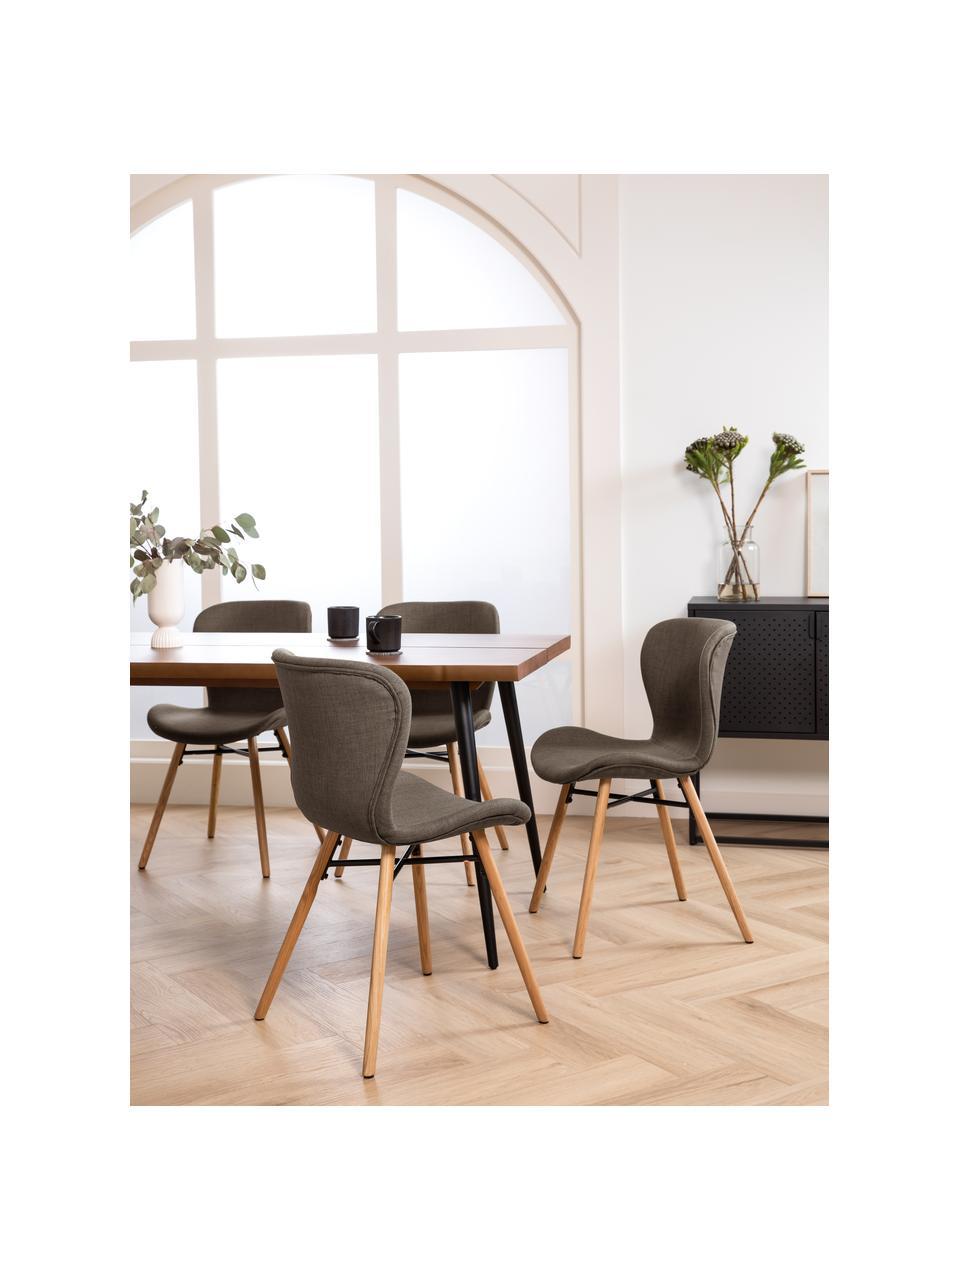 Gestoffeerde stoelen Batilda in kaki, 2 stuks, Bekleding: polyester, Poten: gelakt en geolied massief, Geweven stof kaki, eikenhout, B 47 x D 53 cm